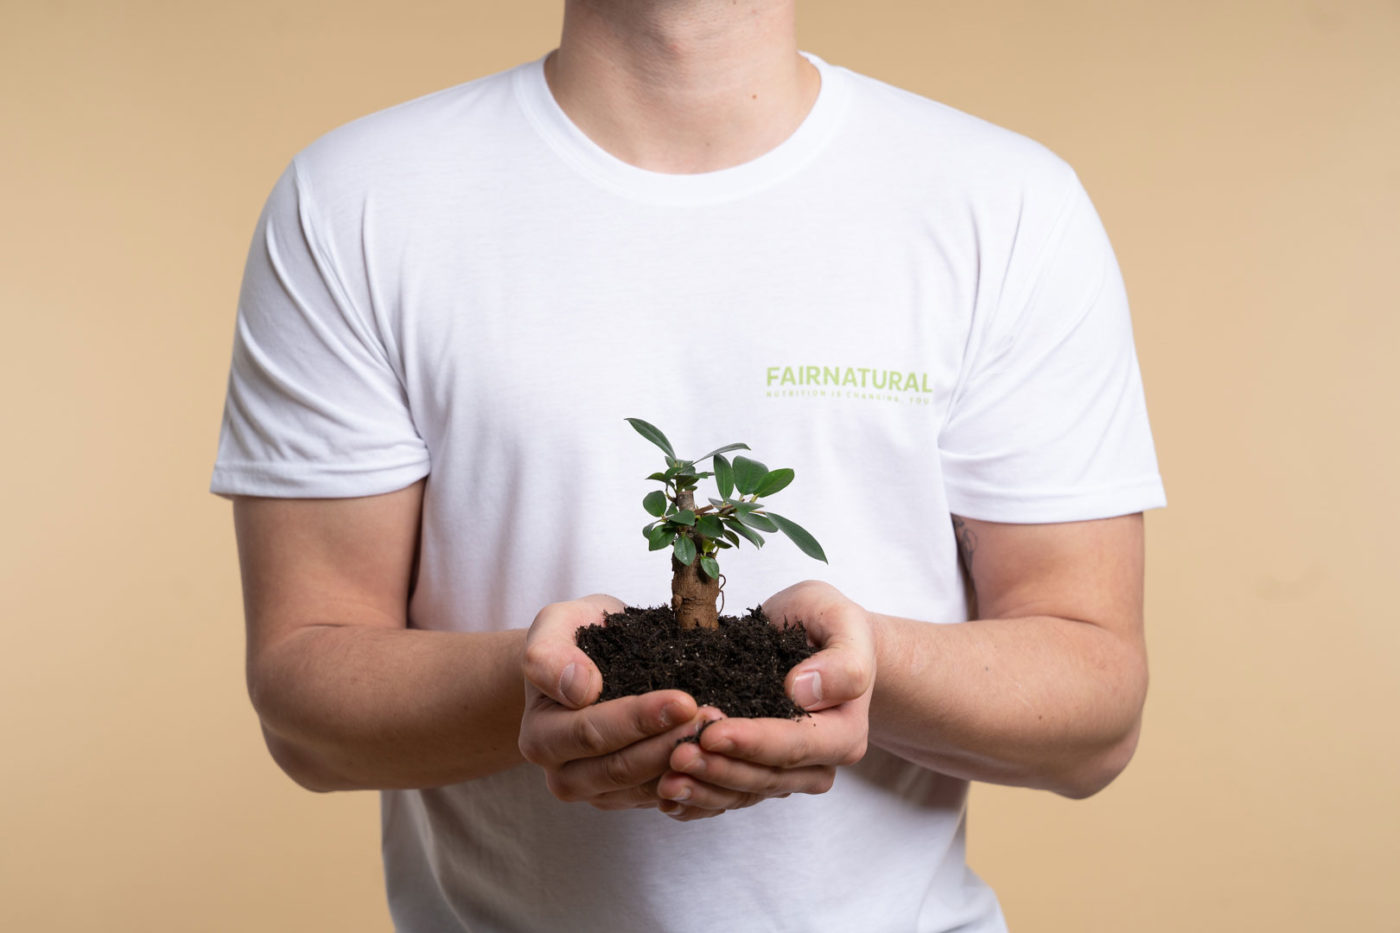 Nachhaltig_fairnatural